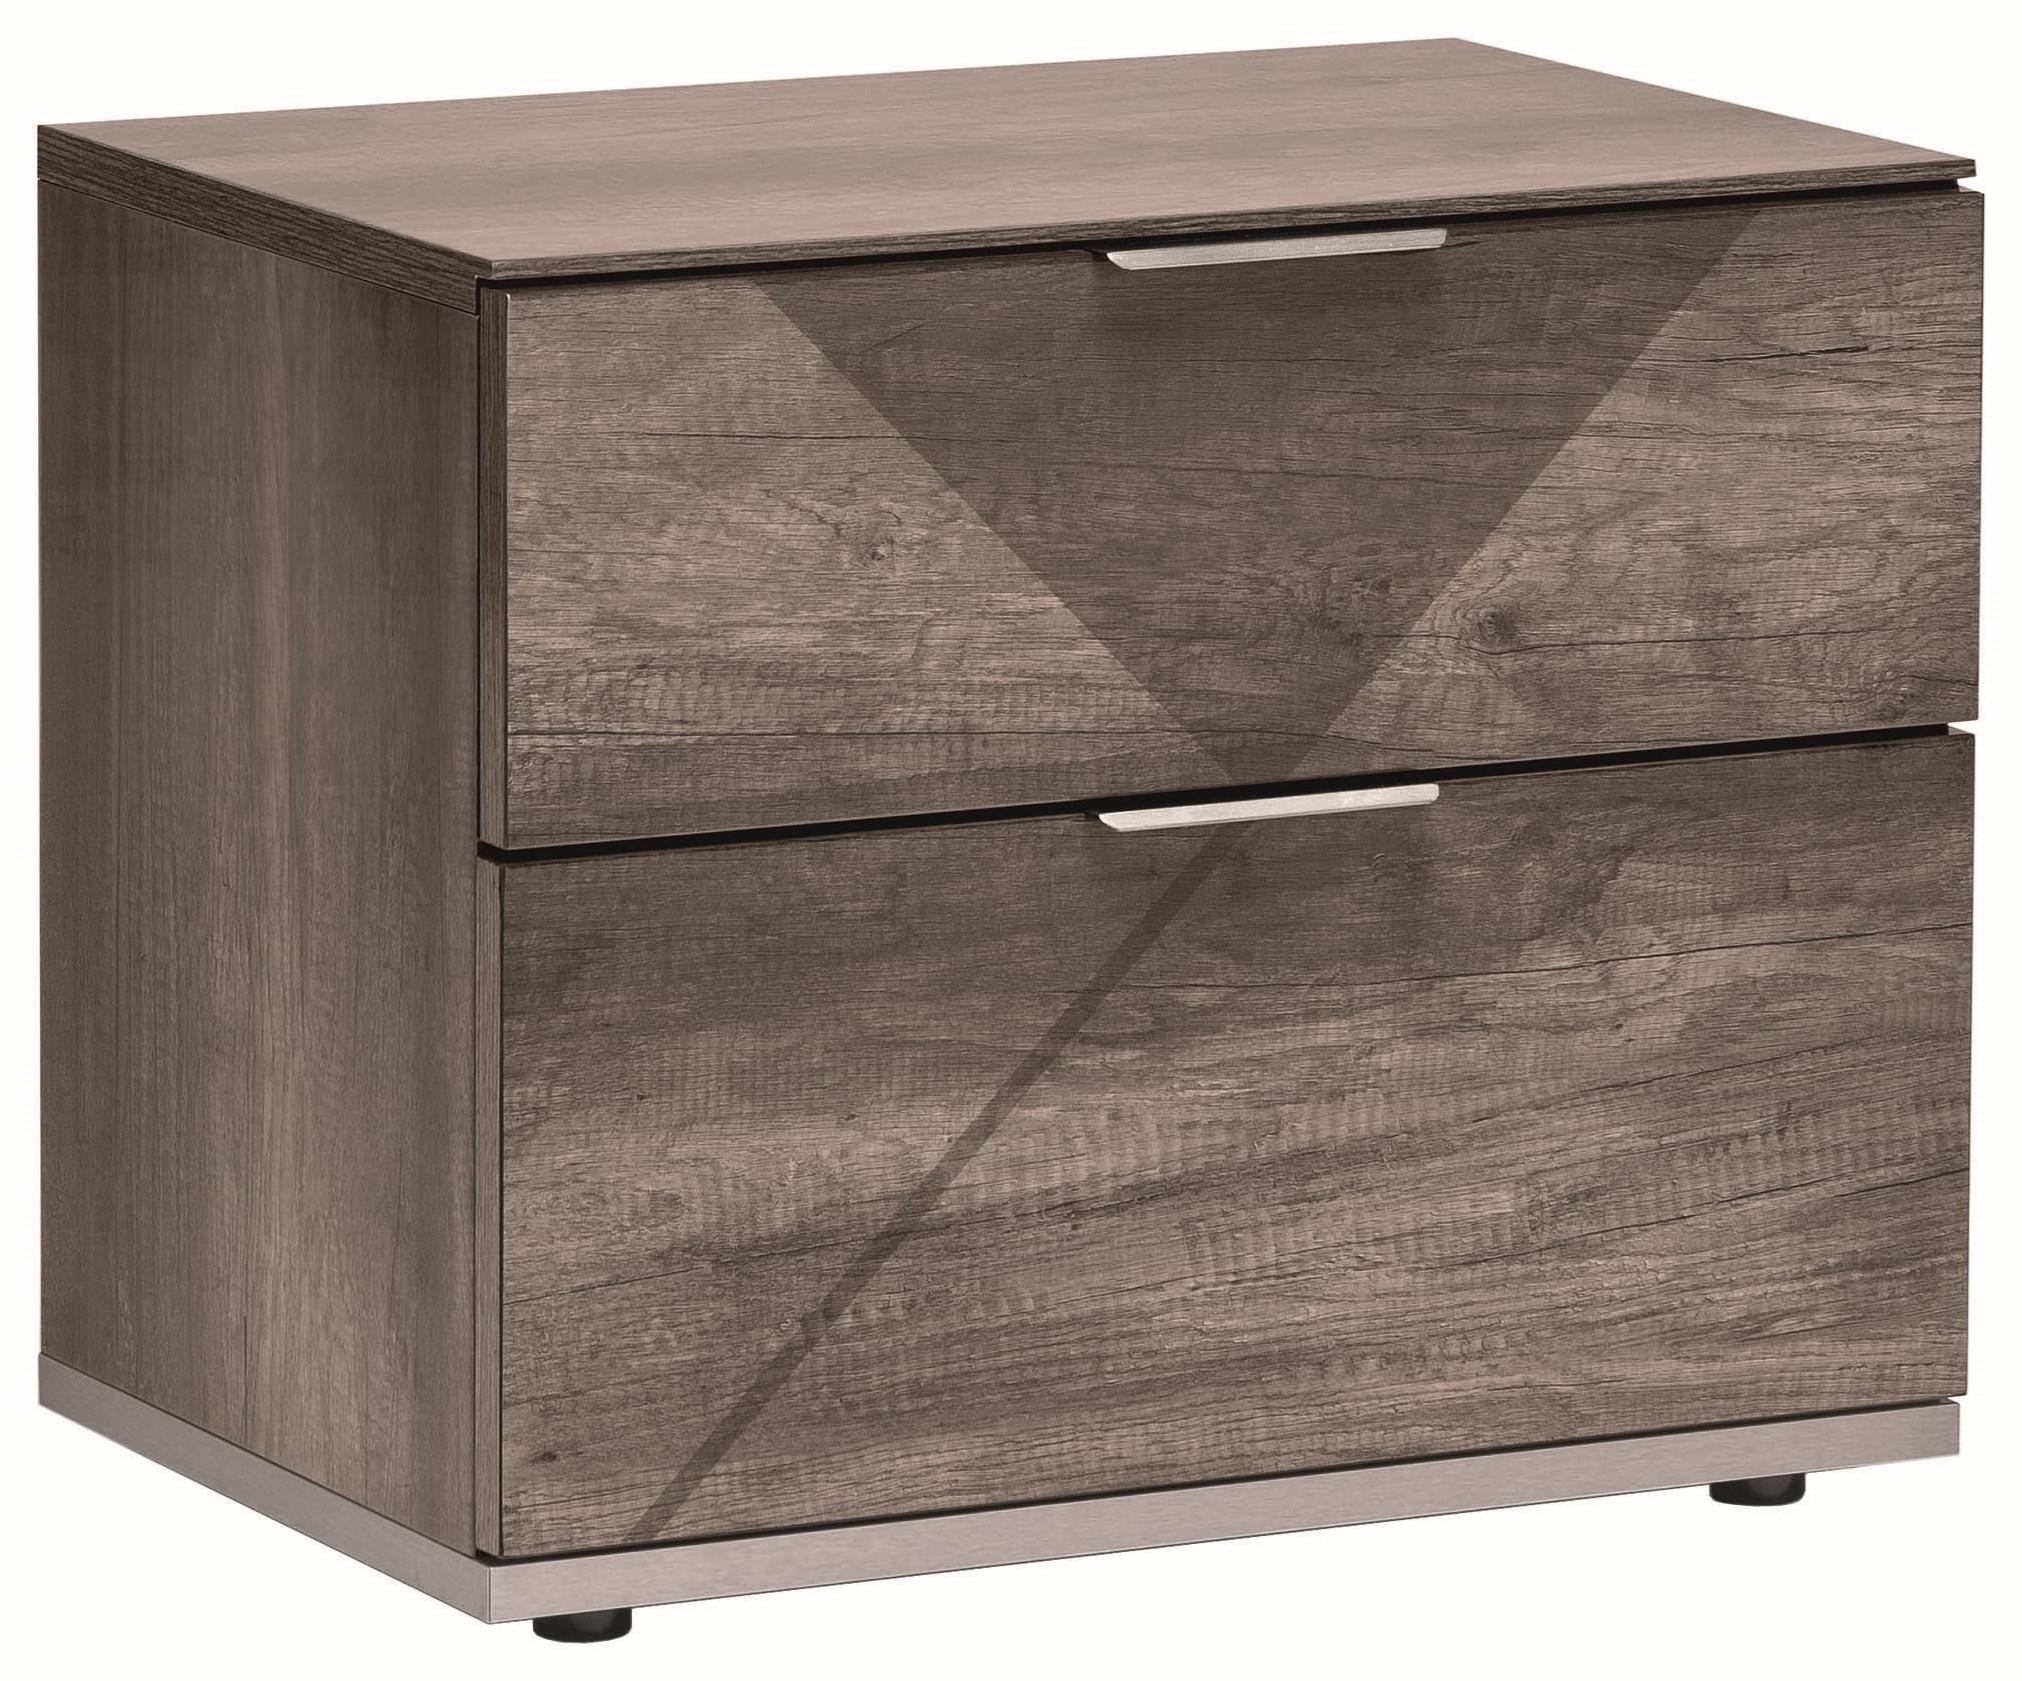 Favignana Nightstand by Alf Italia at HomeWorld Furniture